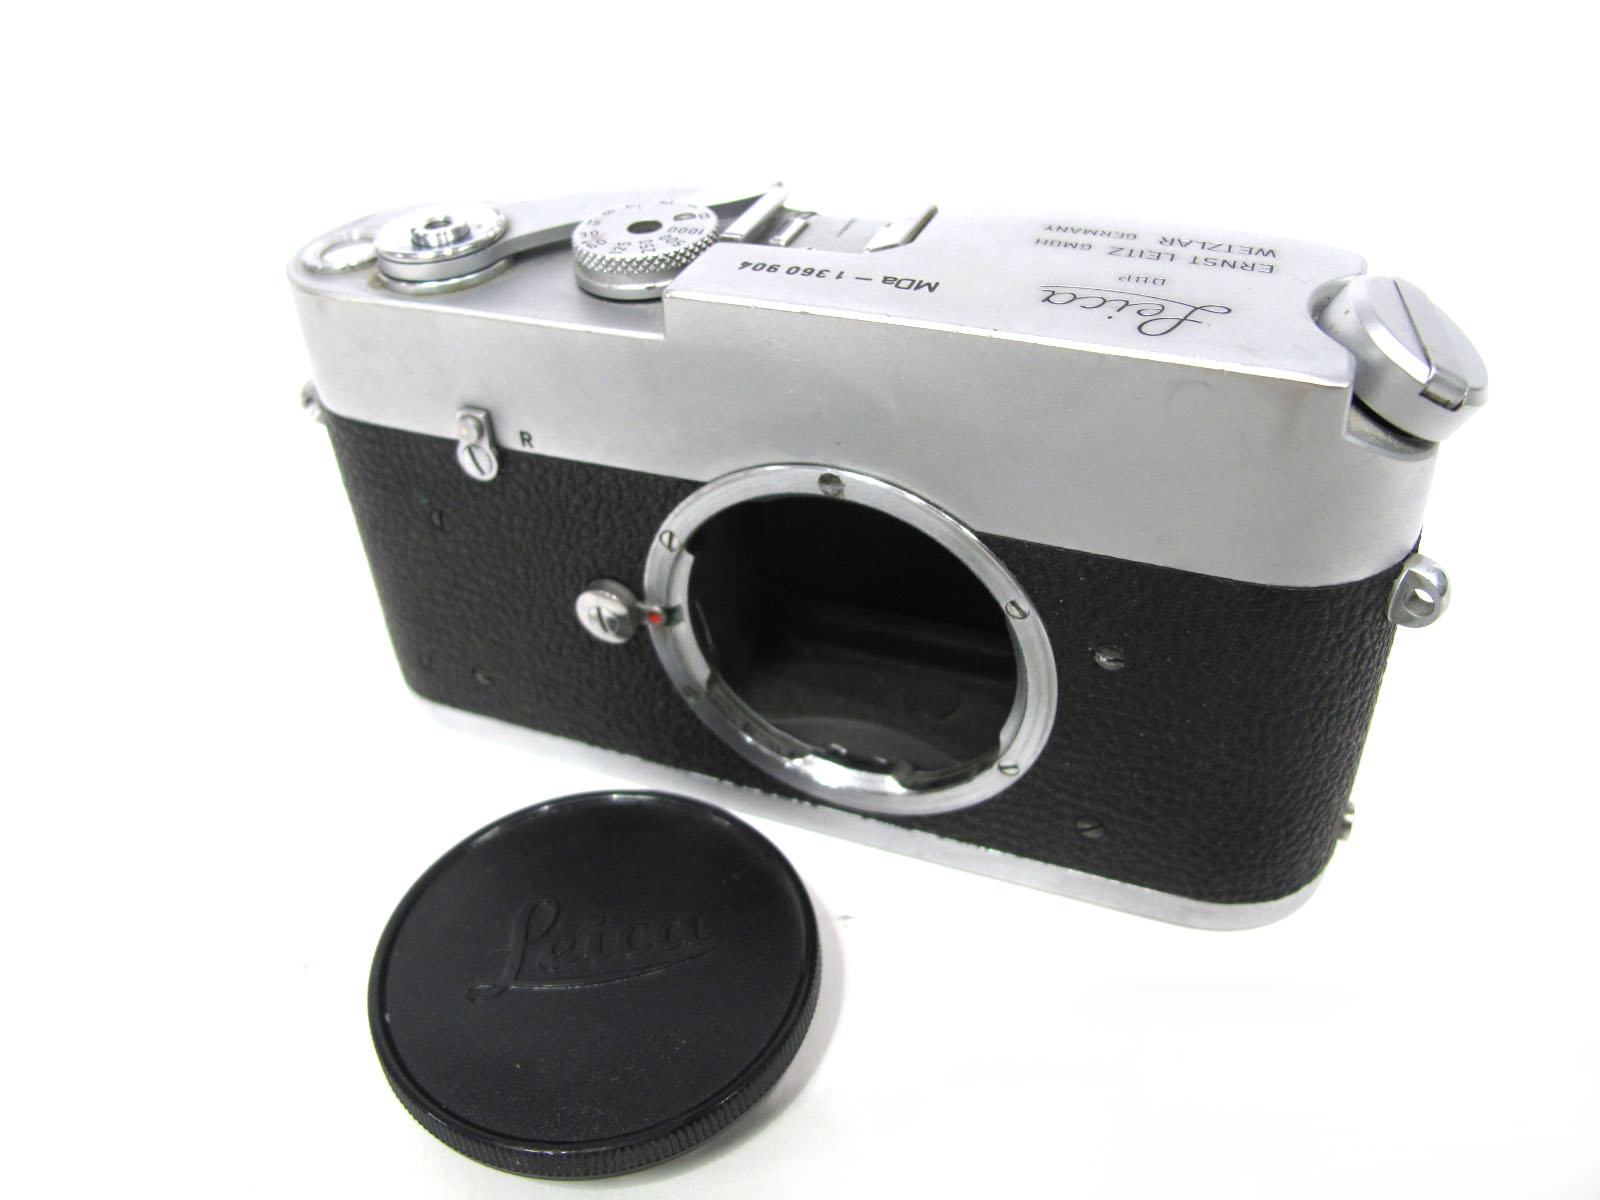 Leica MDa - 1360904 Body Only.